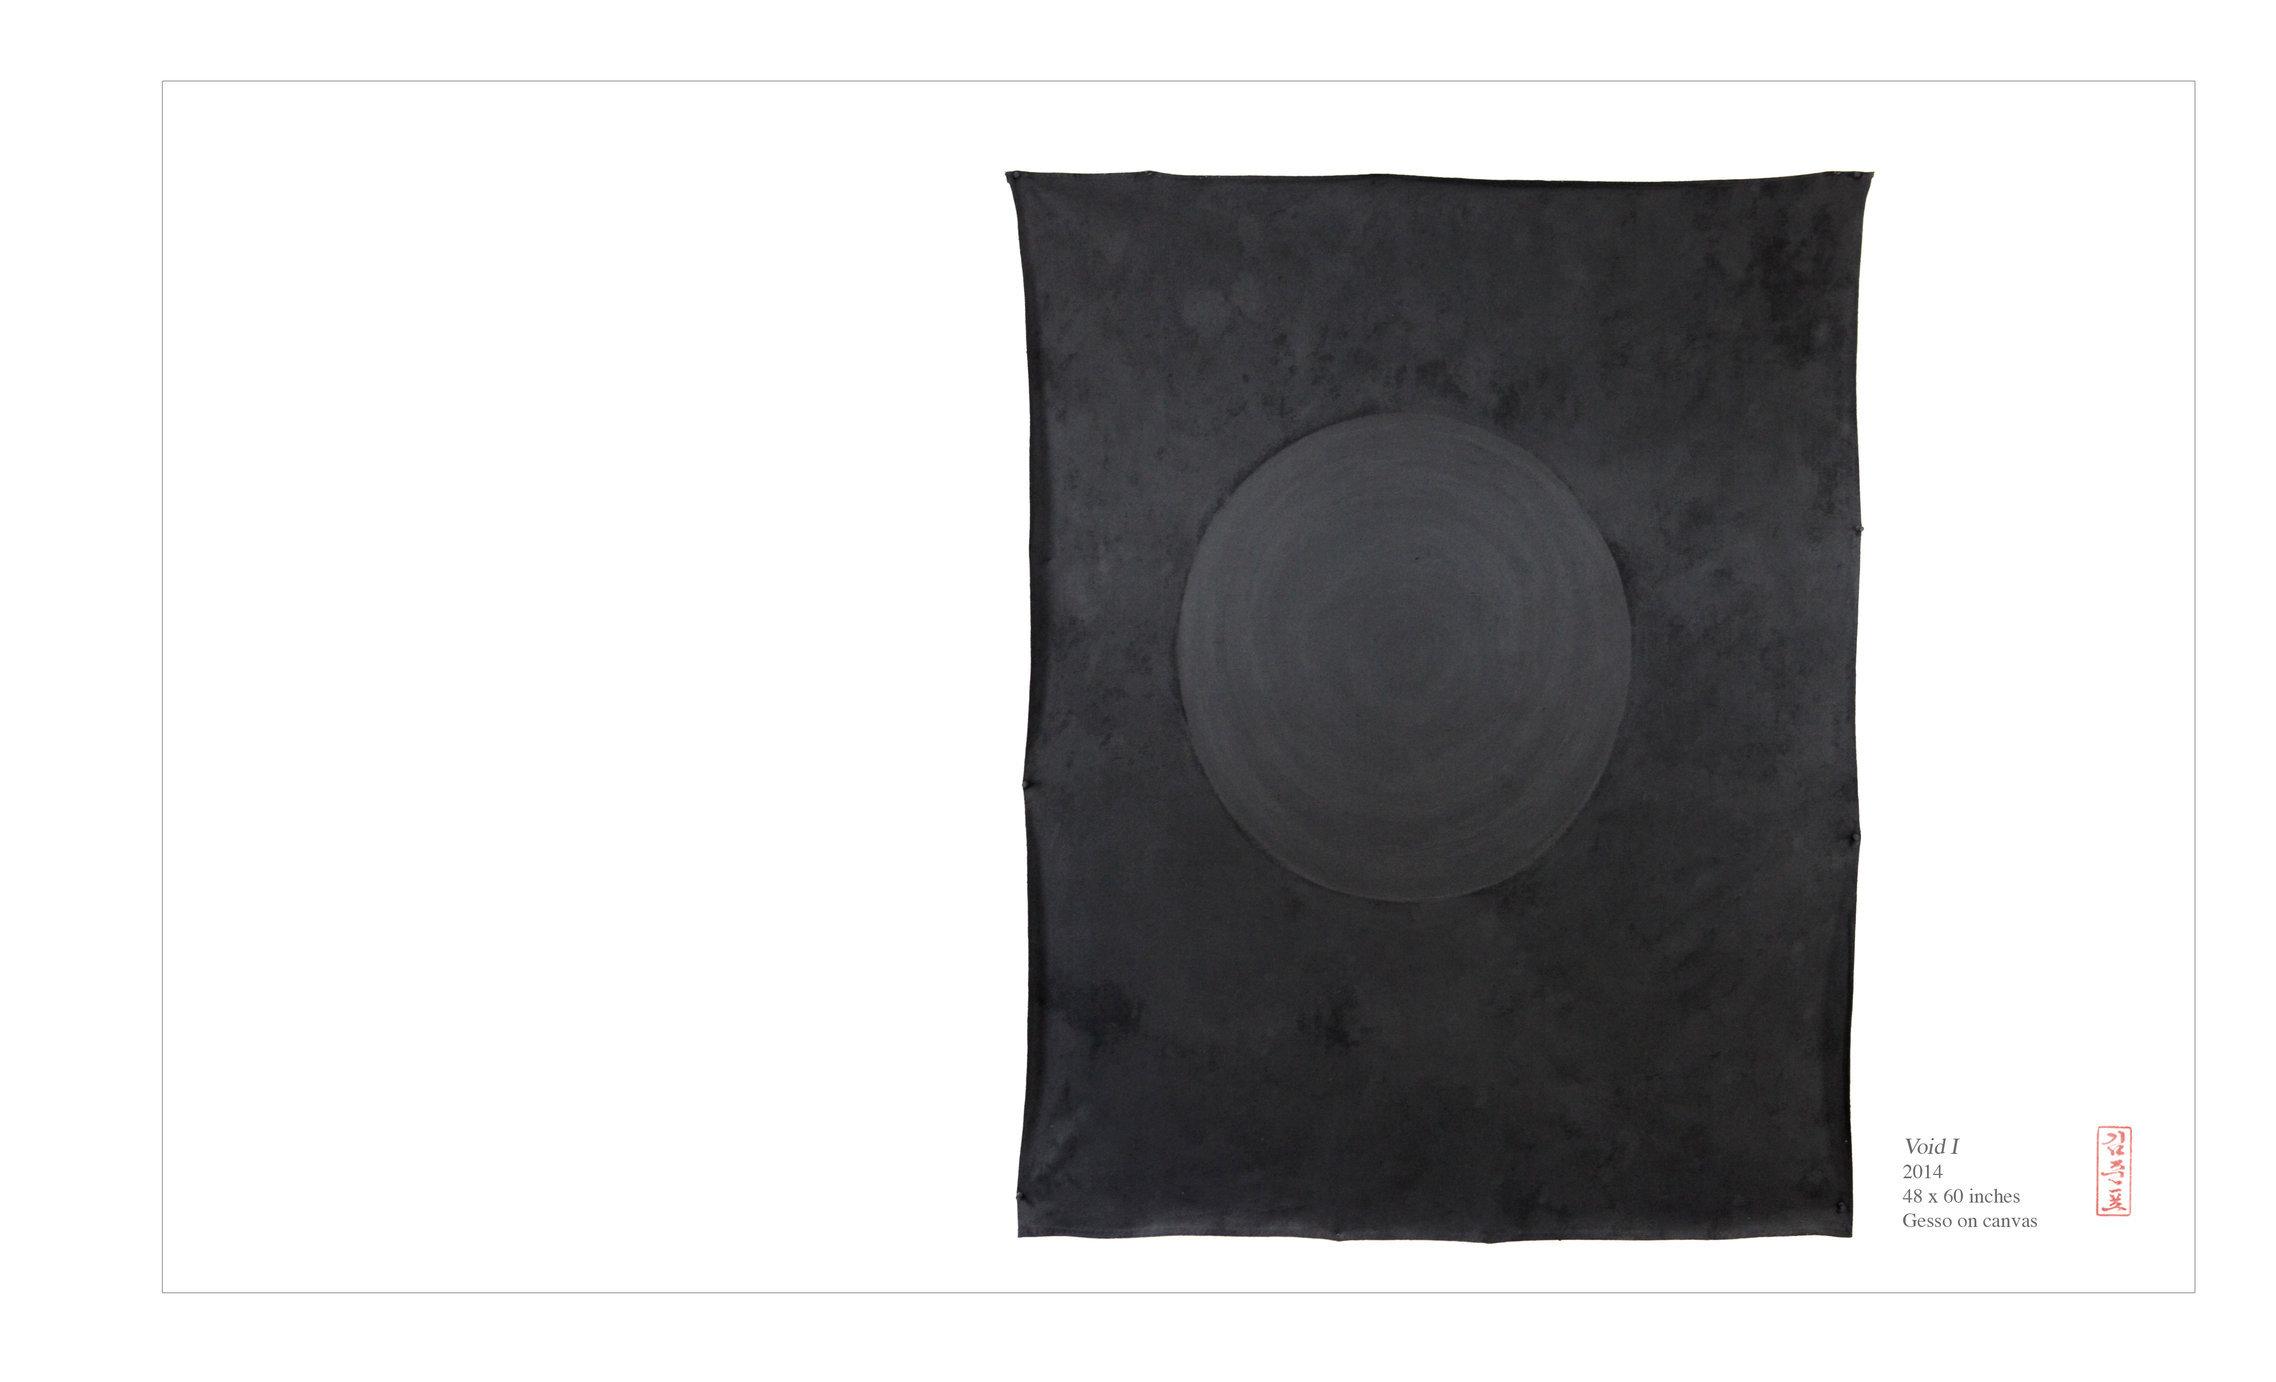 gong 1 f.jpg